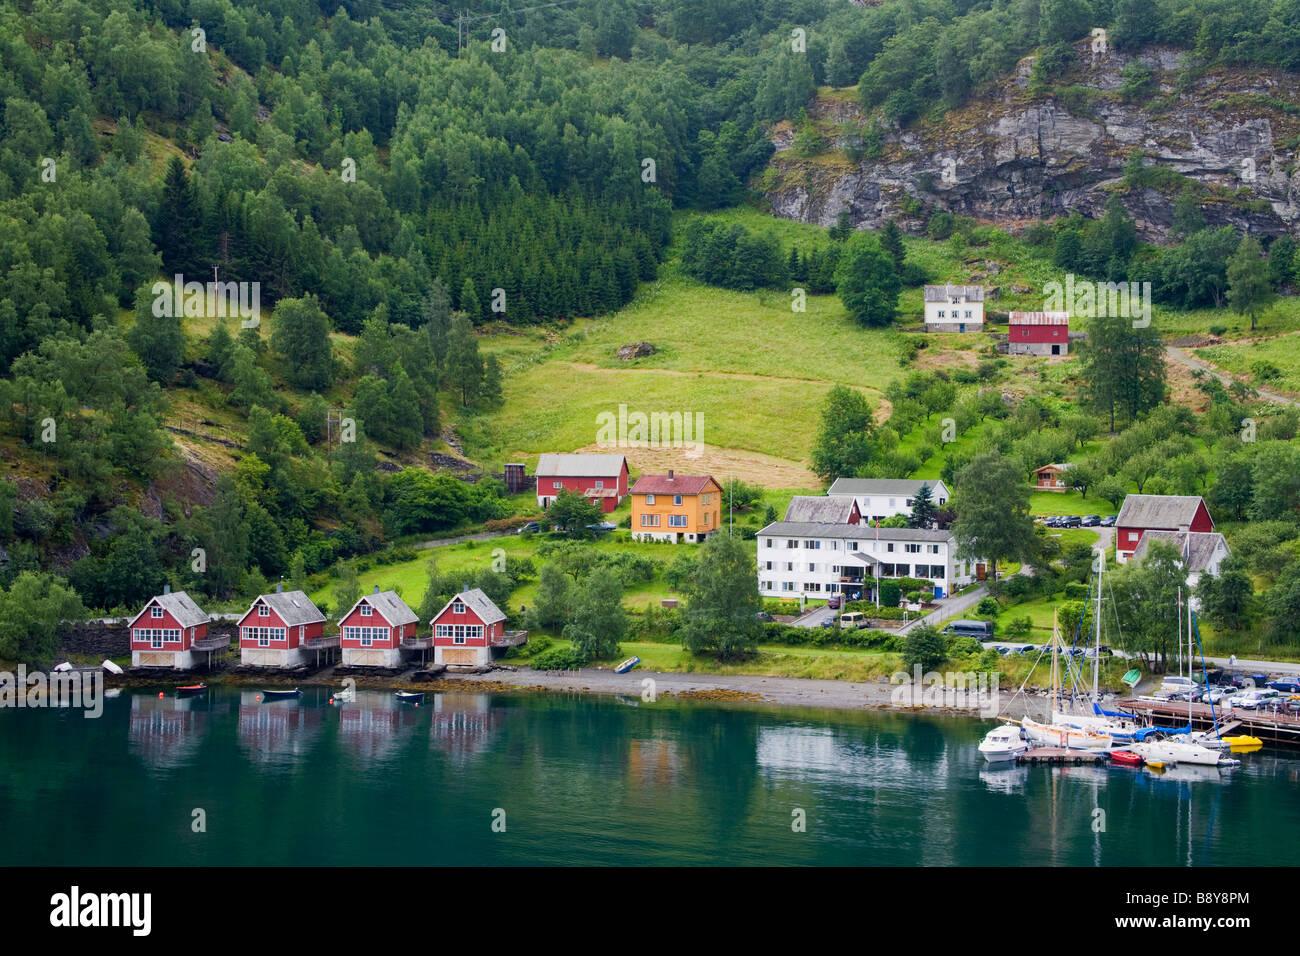 Erhöhte Ansicht eines Dorfes an der Küste, Flam, Aurlandsfjord, Sogn Og Fjordane, Norwegen Stockbild